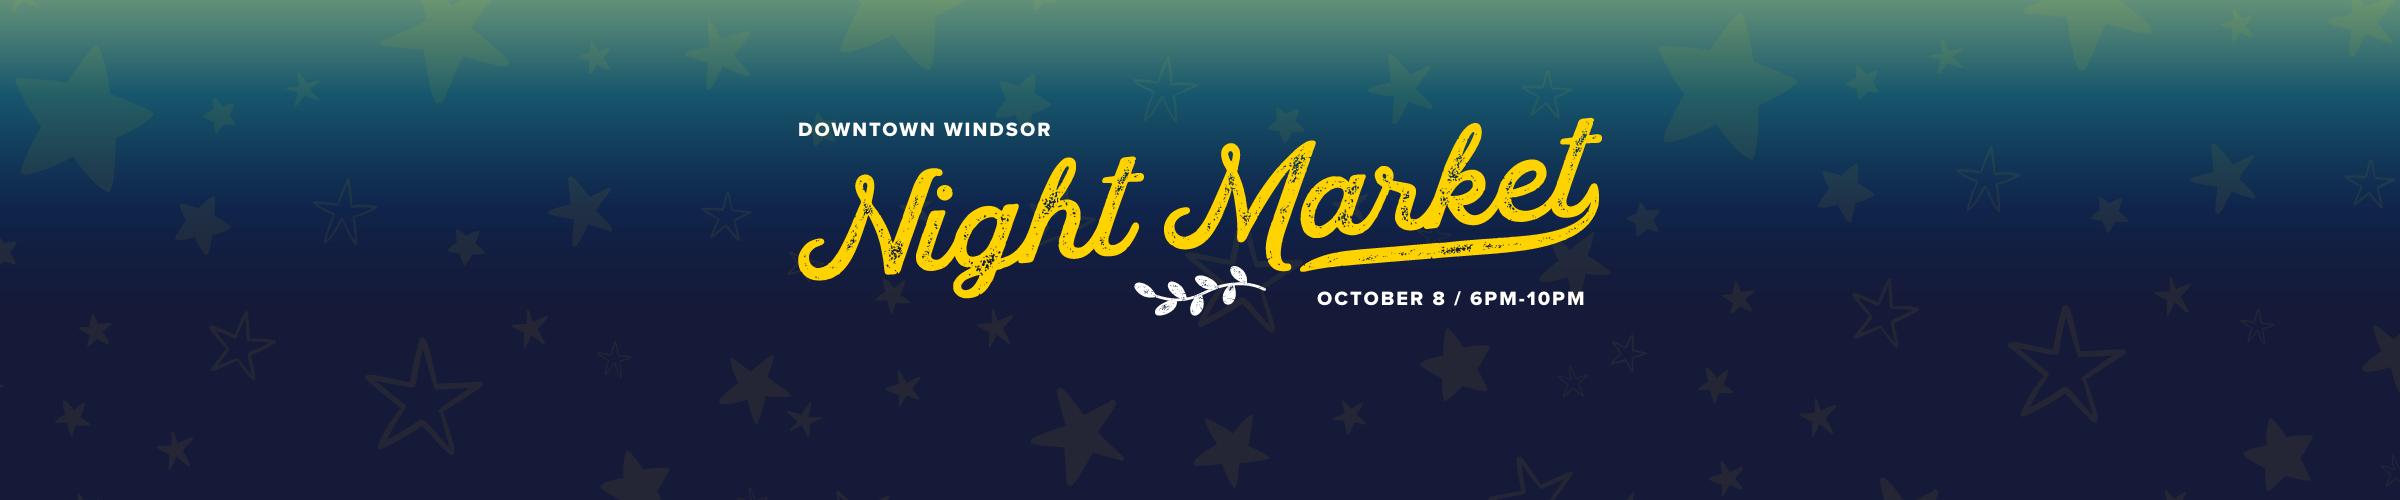 Downtown Windsor Night Market